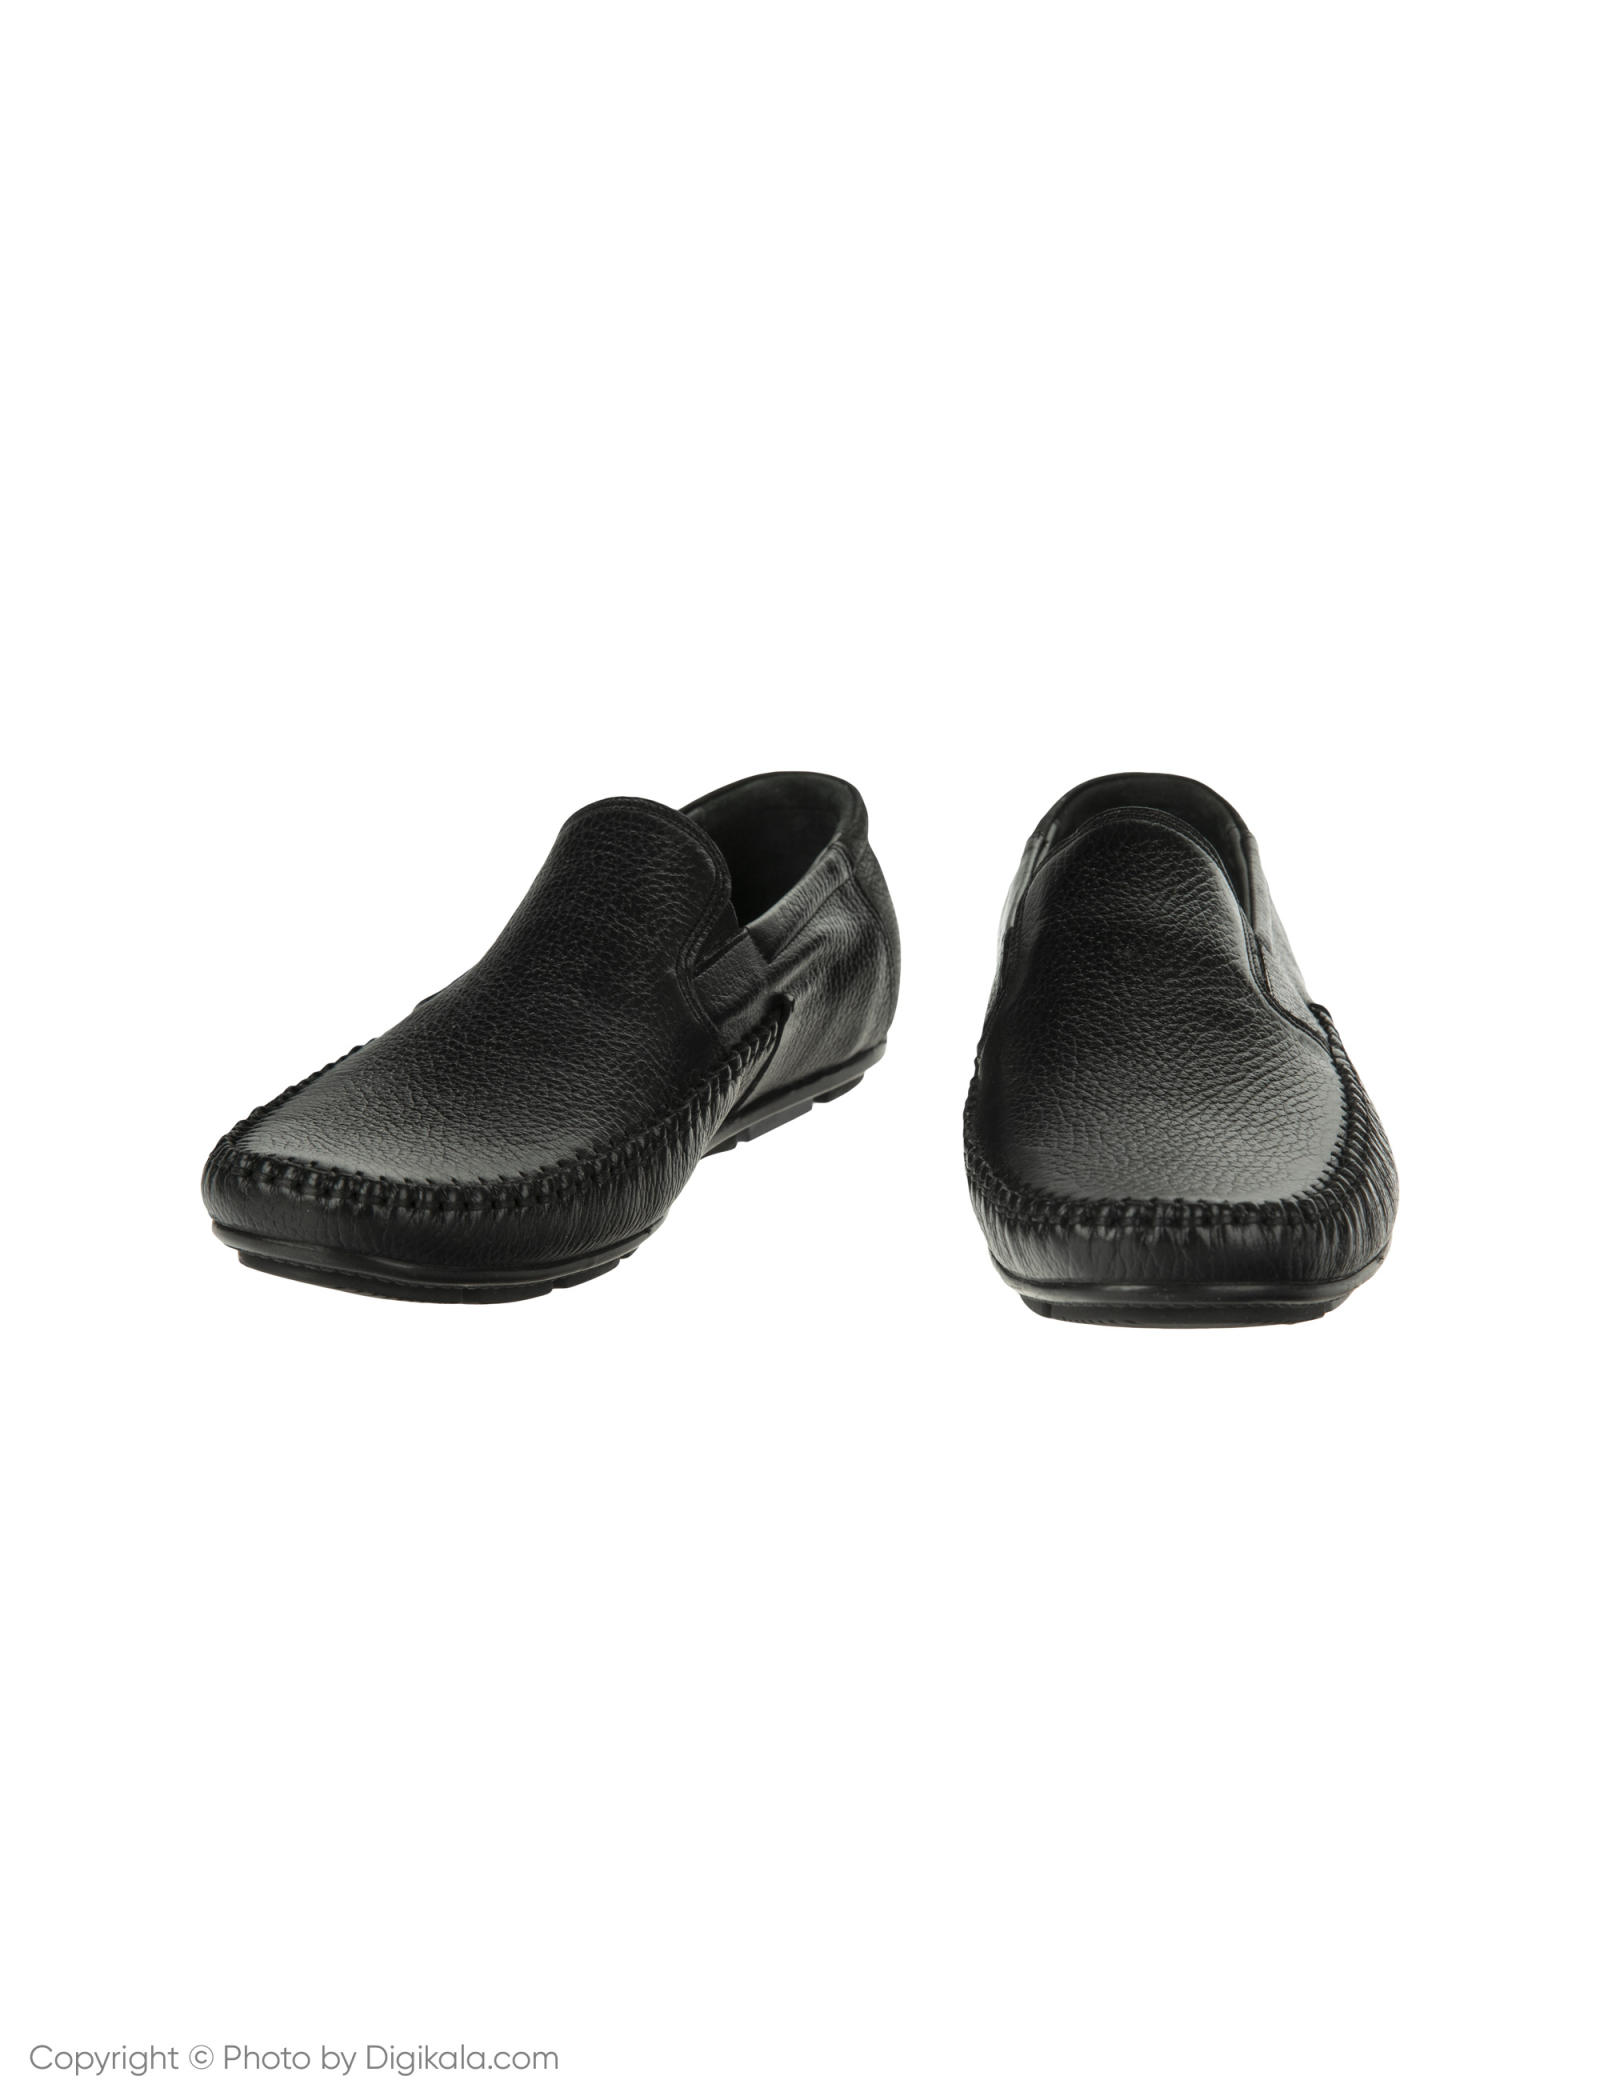 کفش روزمره مردانه ساتین مدل SN7177A-101 -  - 3